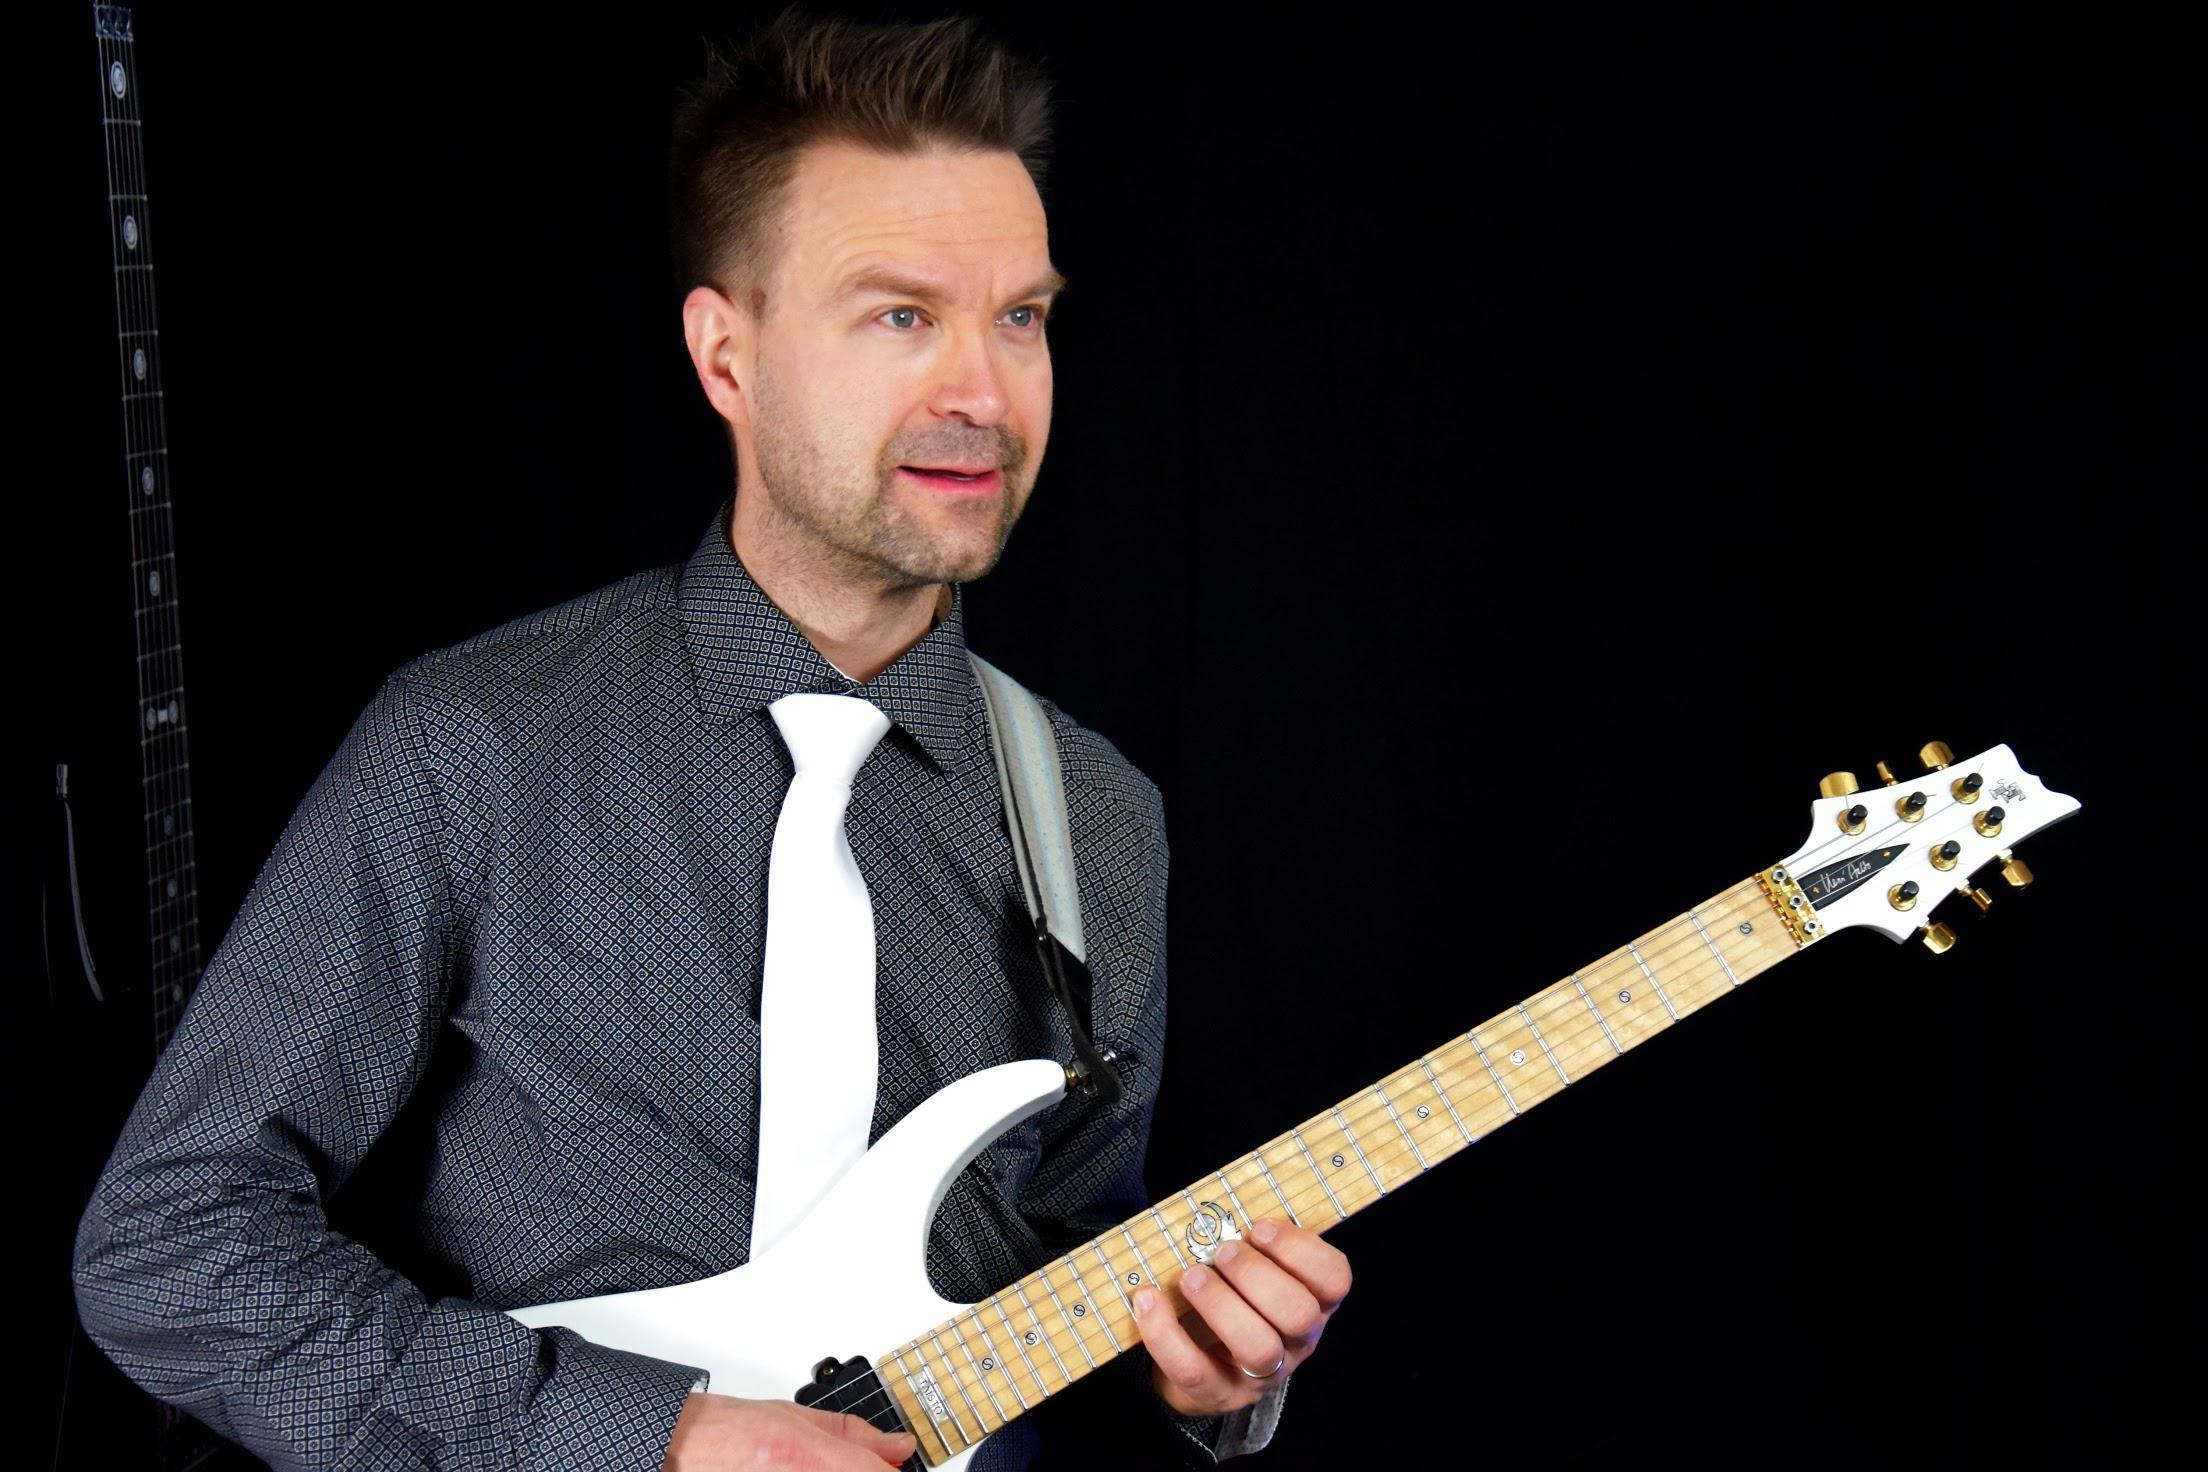 Guitar artist - Henri Aalto LIVE